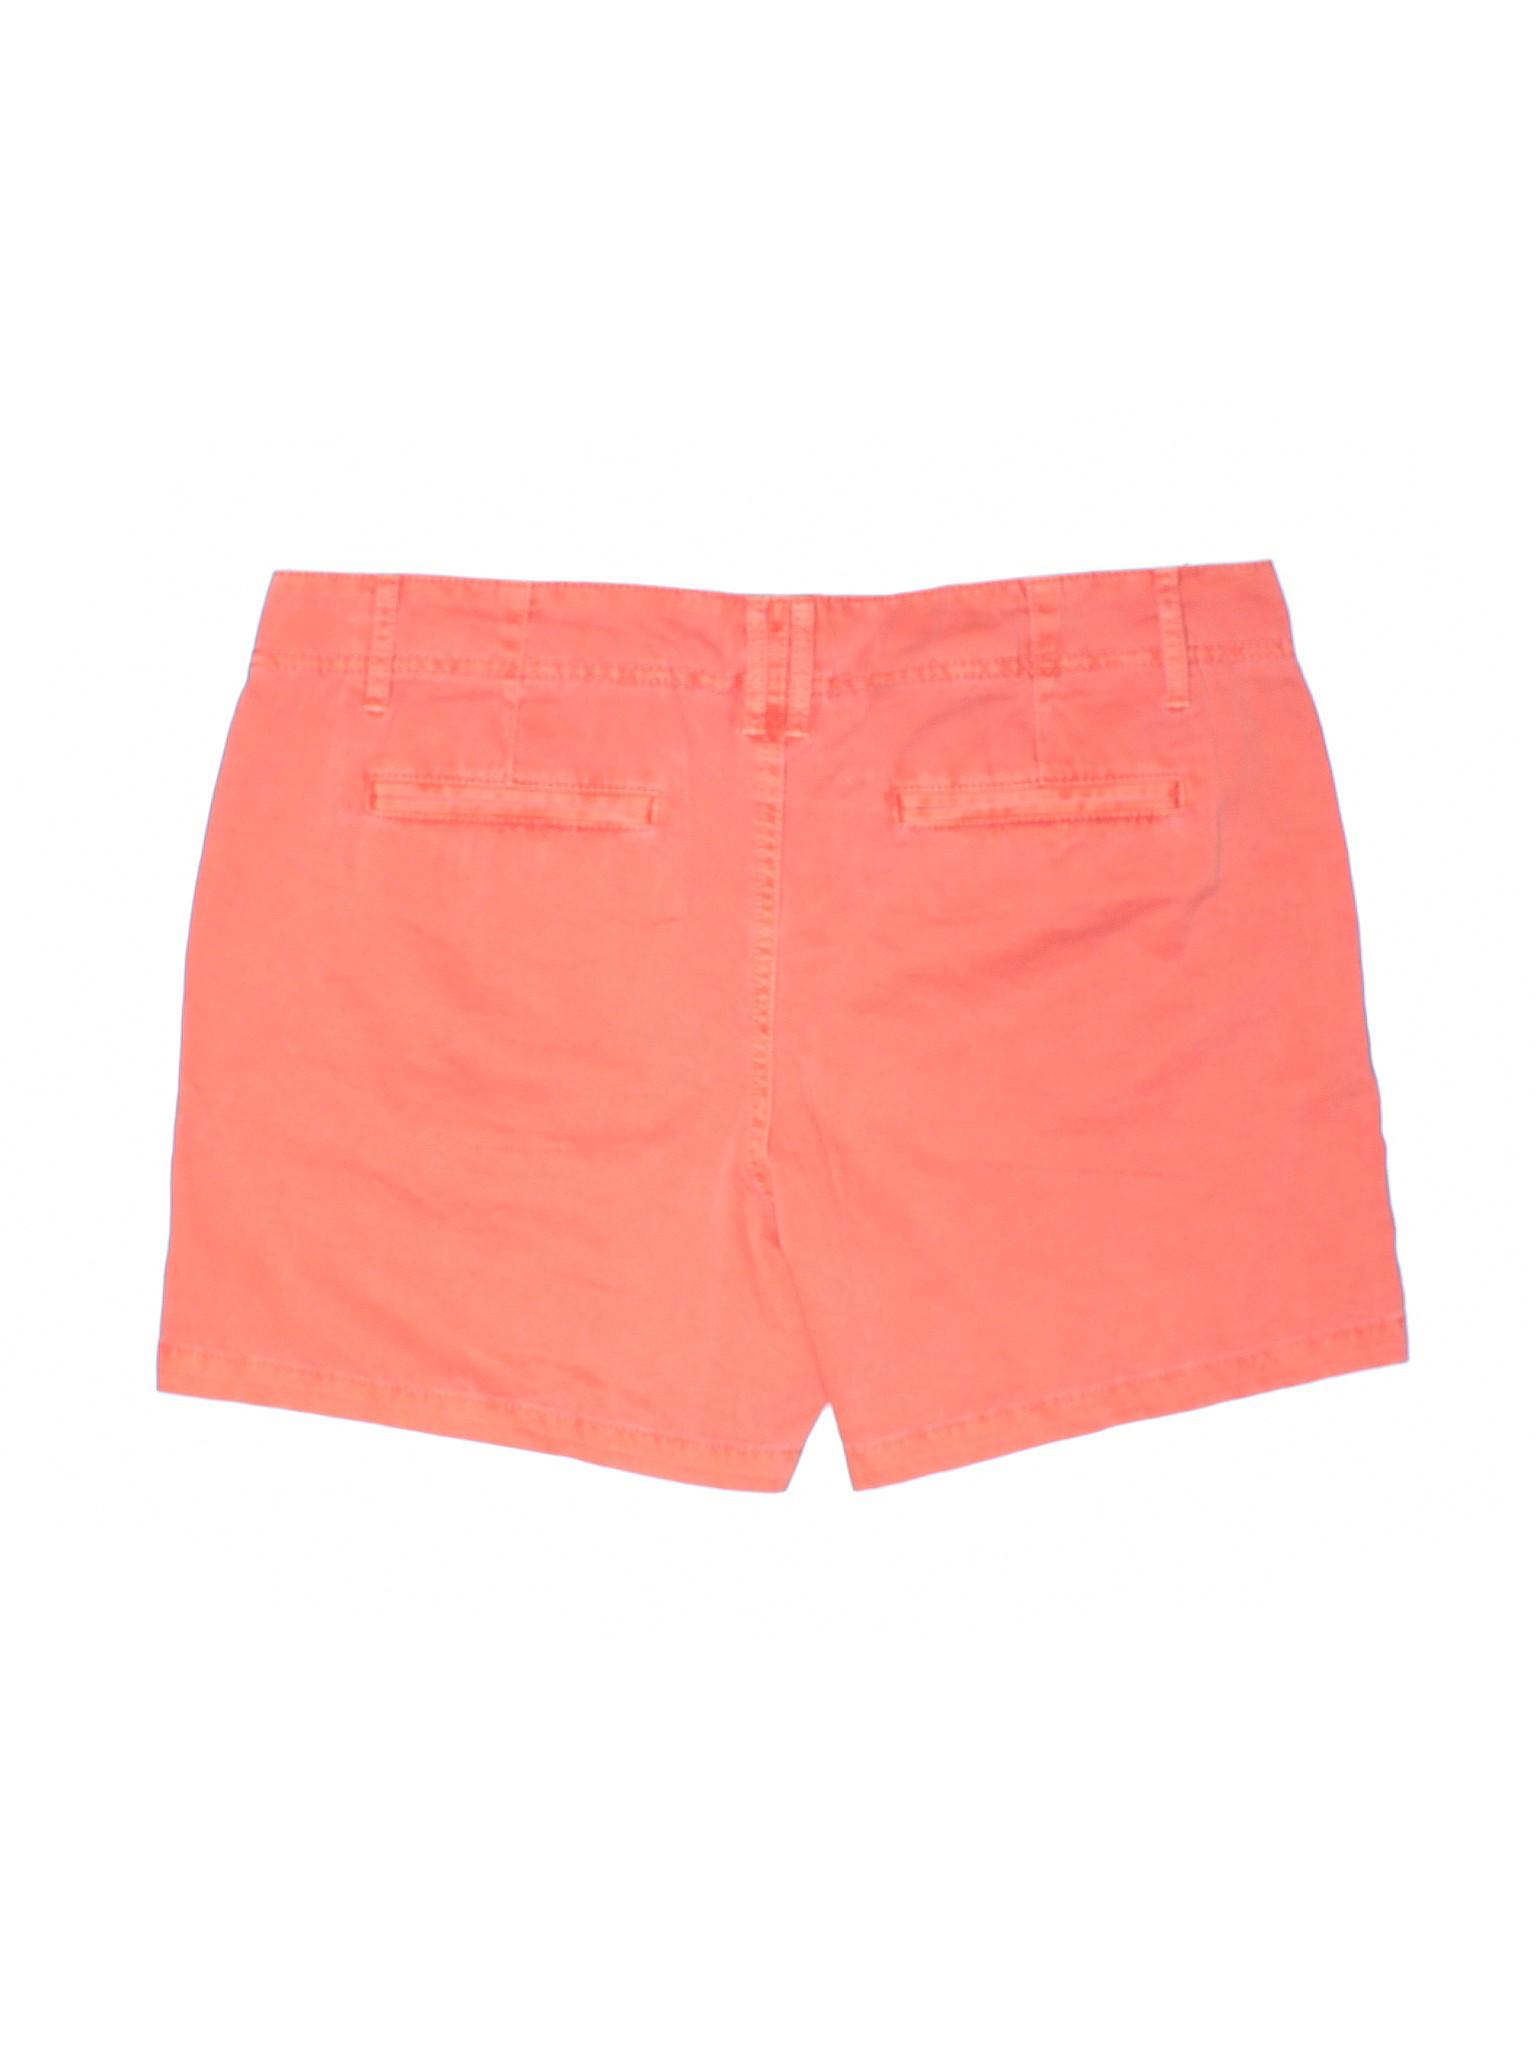 Khaki leisure Boutique Shorts Boutique Merona leisure Merona StxqX